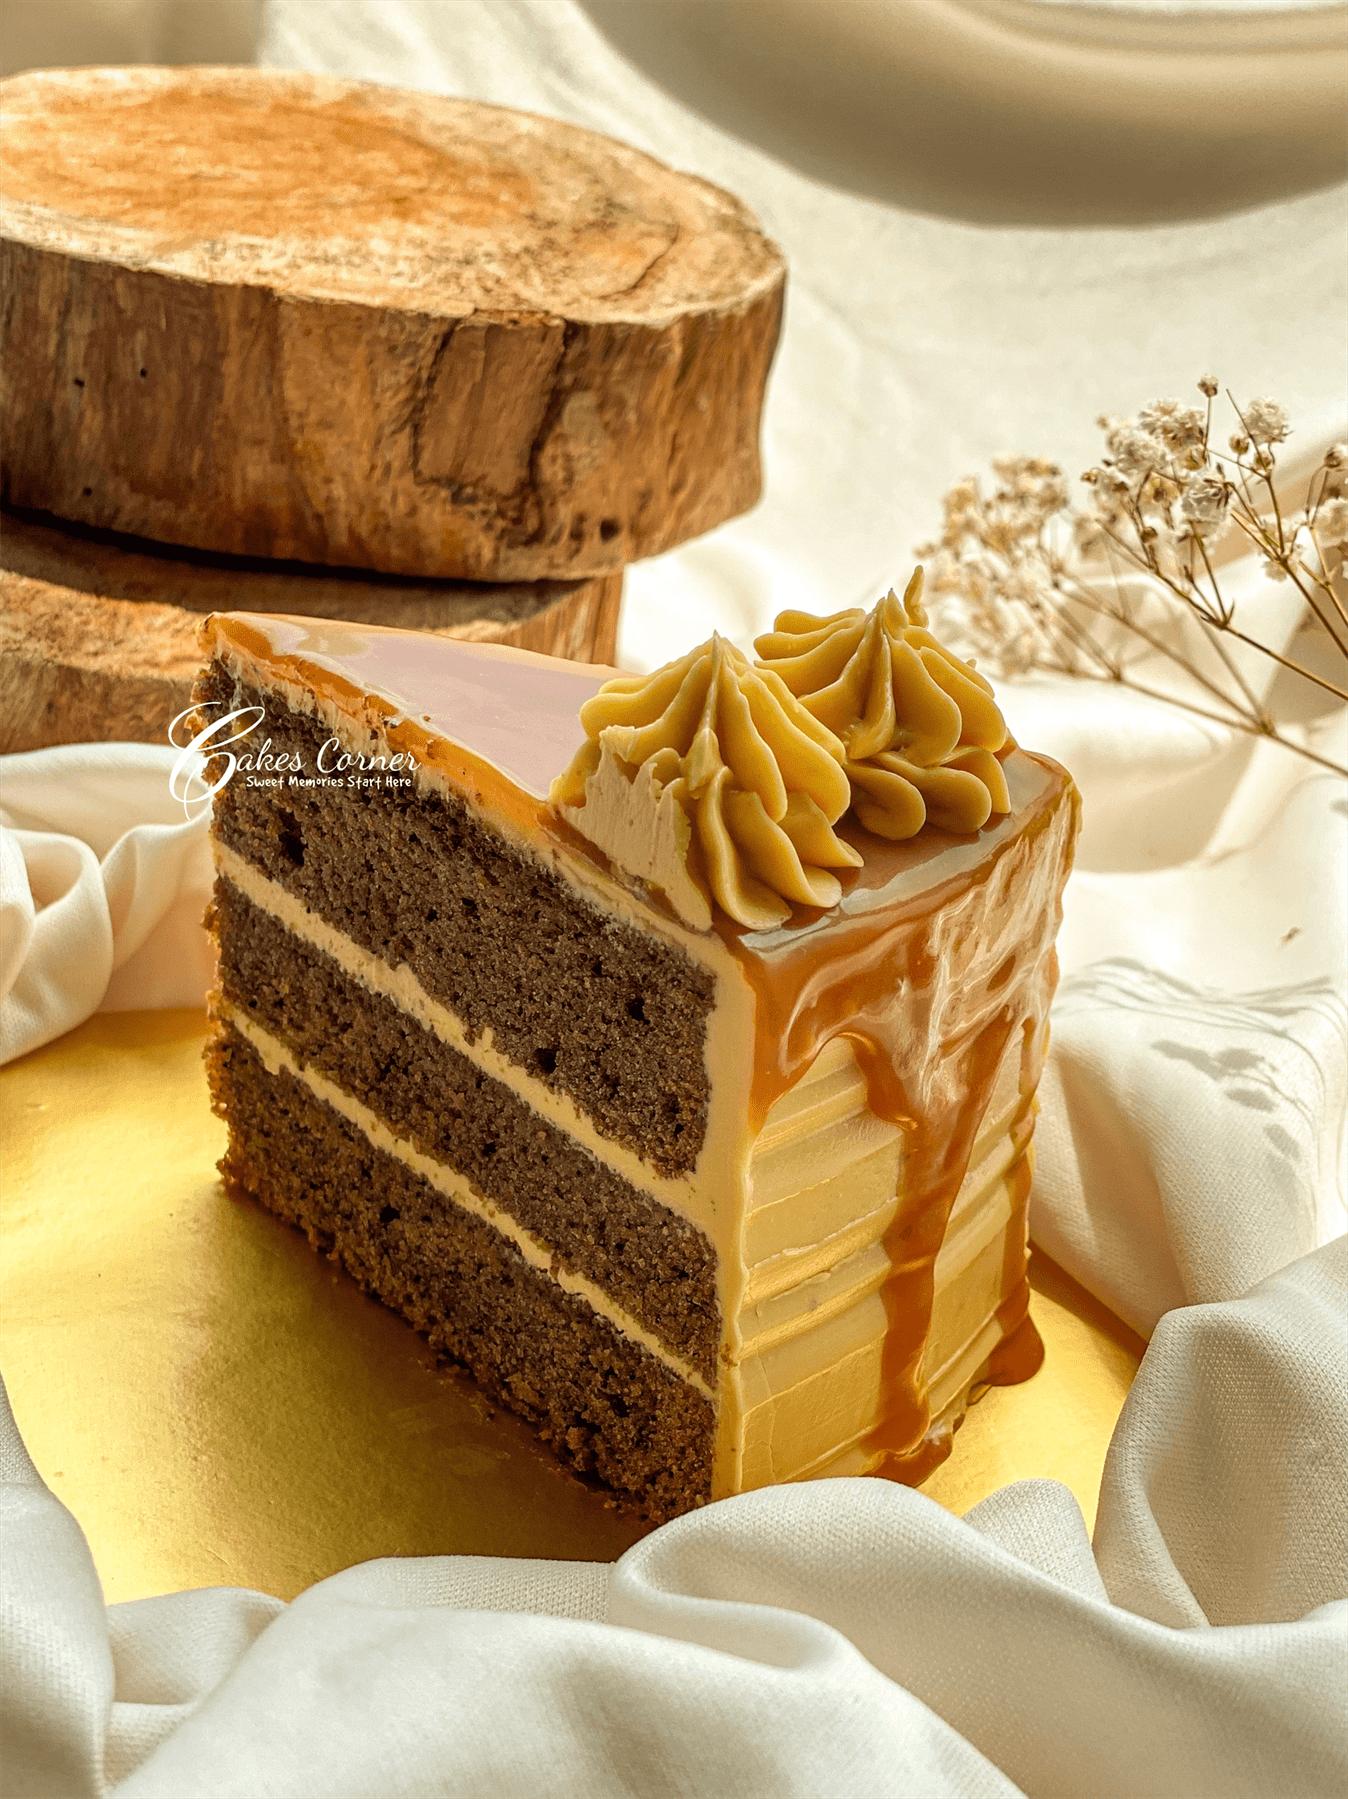 Caramel Macchiato Buttercream Cake